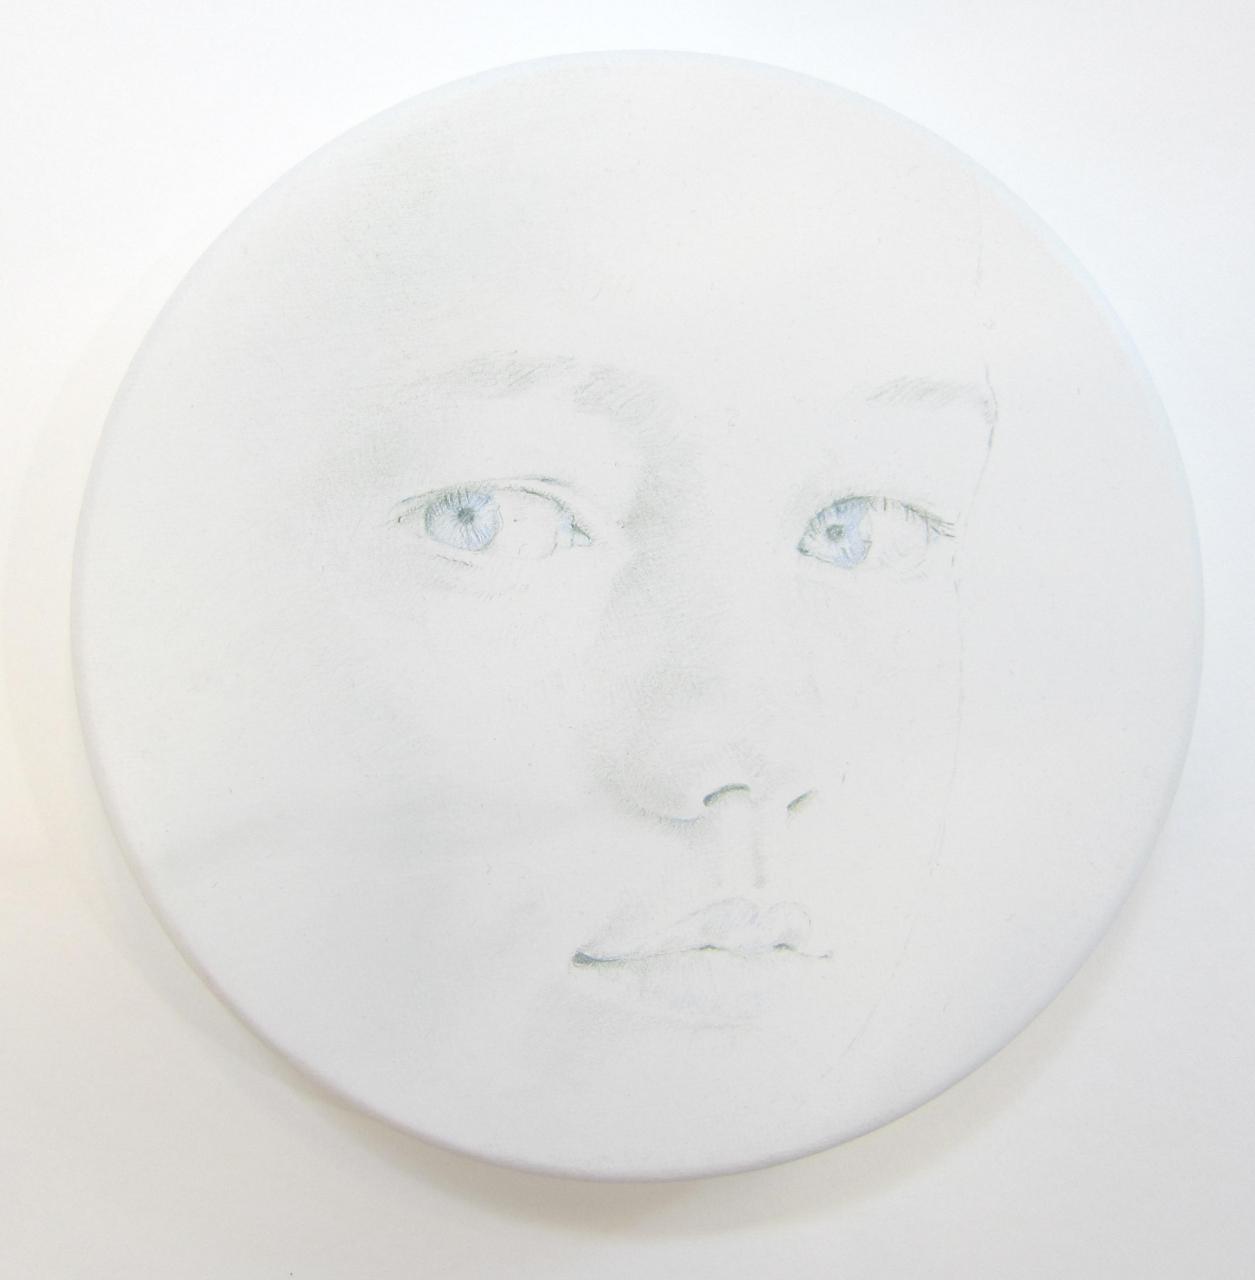 White Tondo No. 13